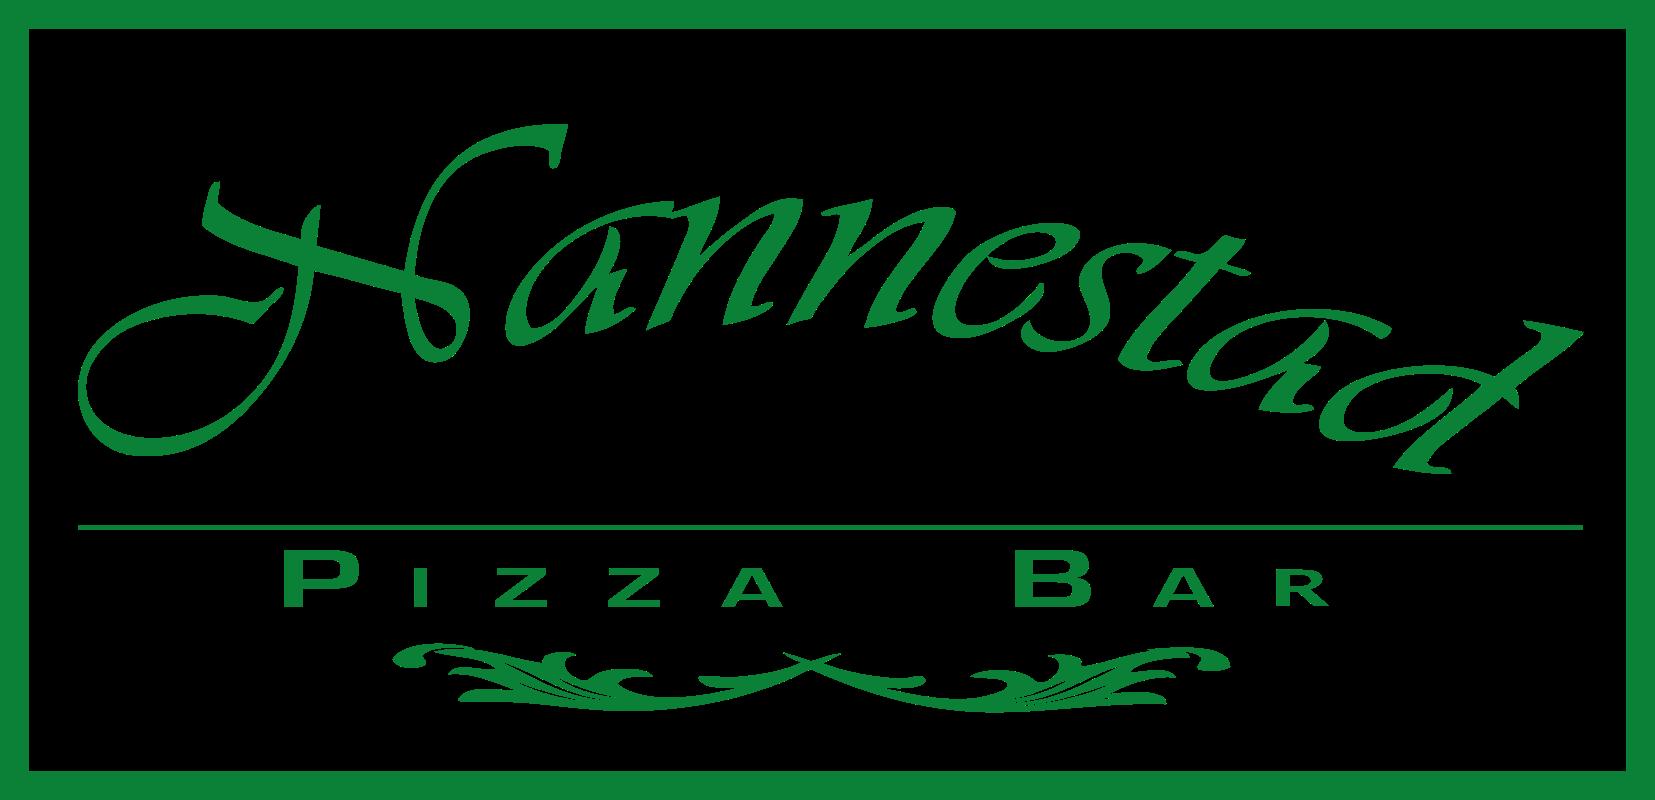 Nannestad Pizzabar